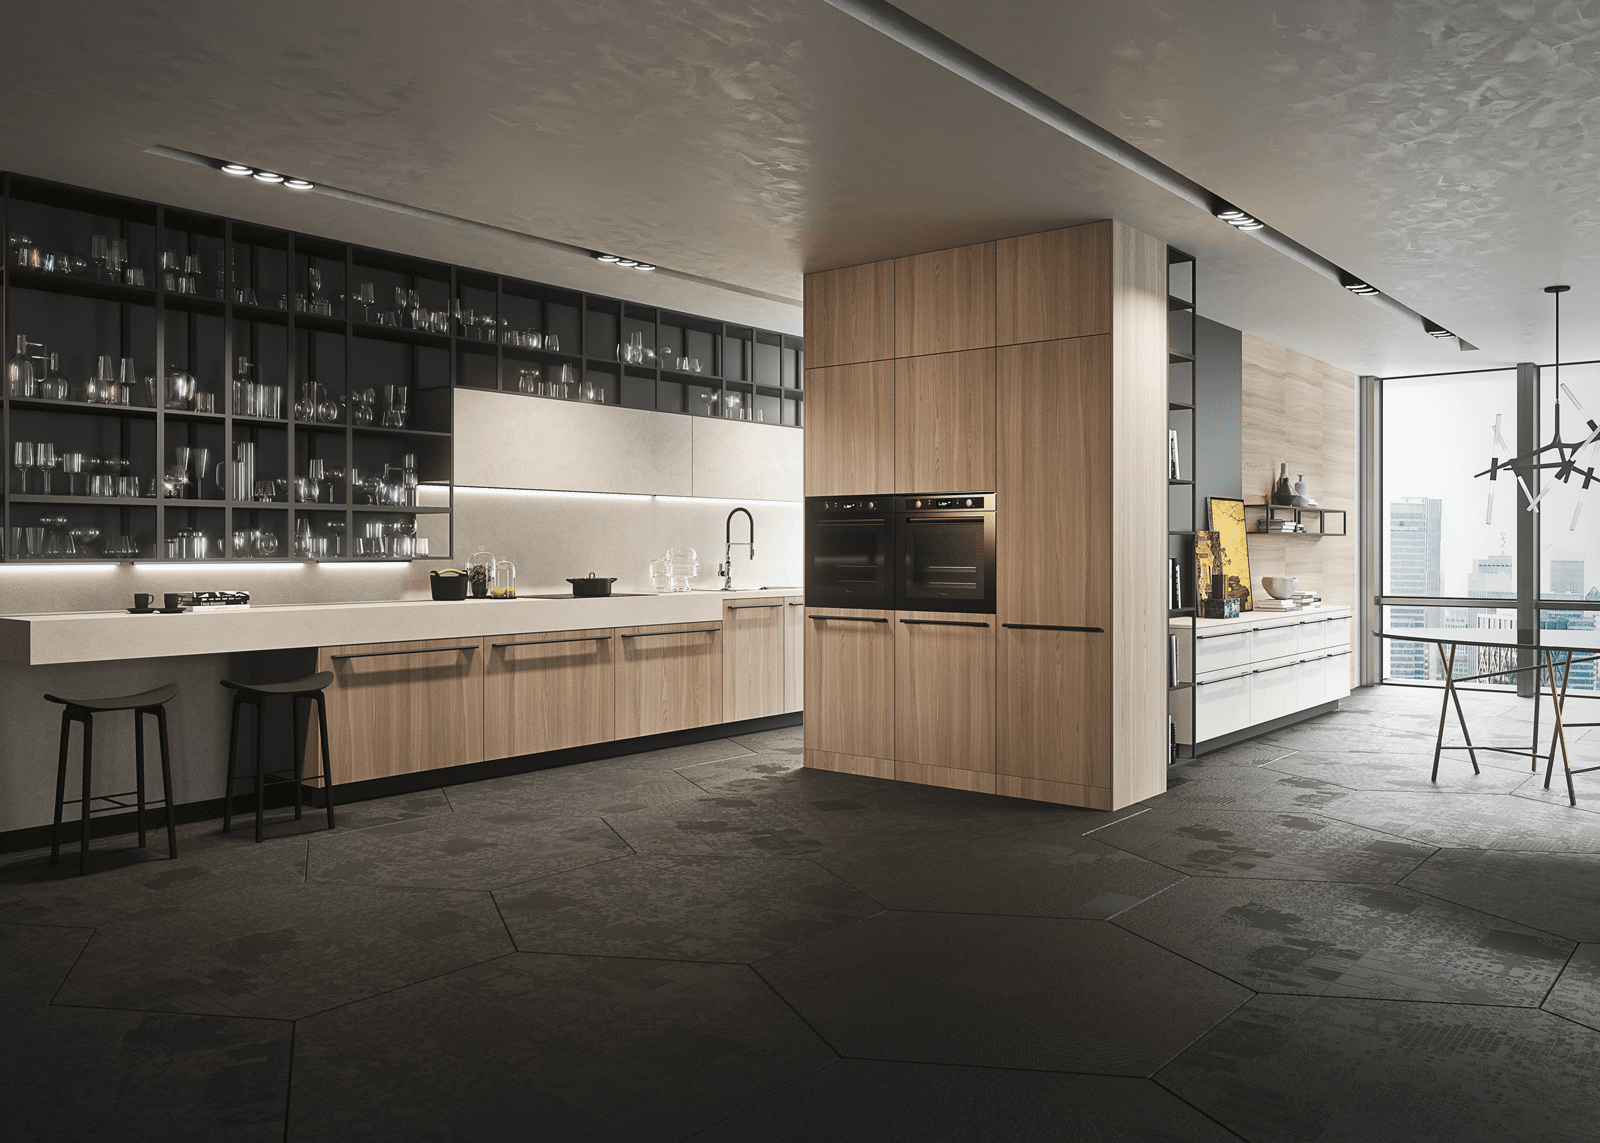 Boiserie attrezzate per le cucine cose di casa for Cucine di design